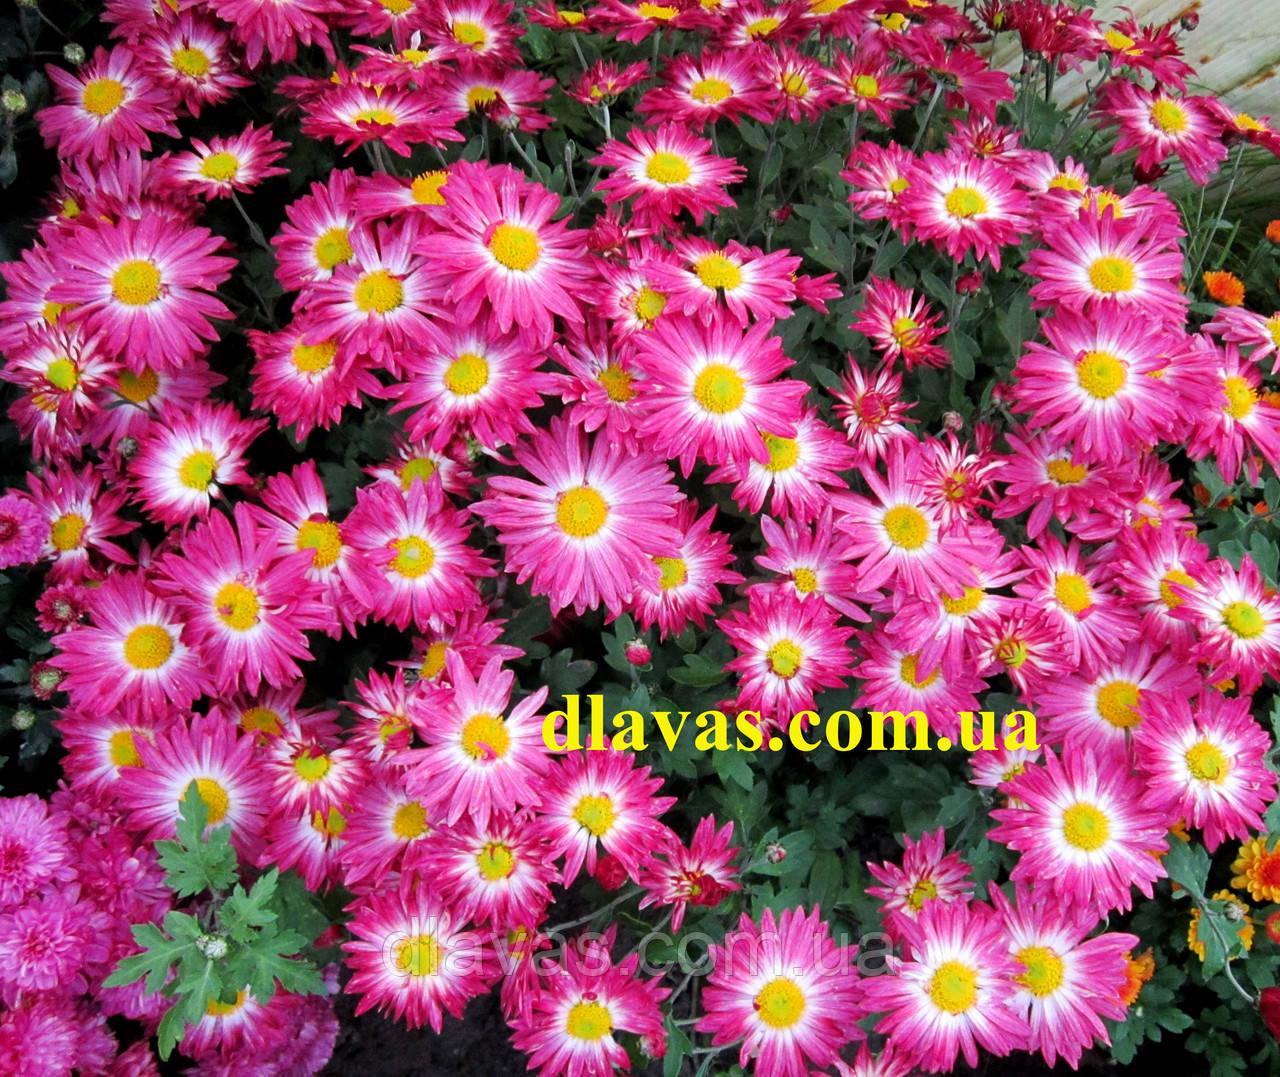 Хризантема мультифлора фото цветов